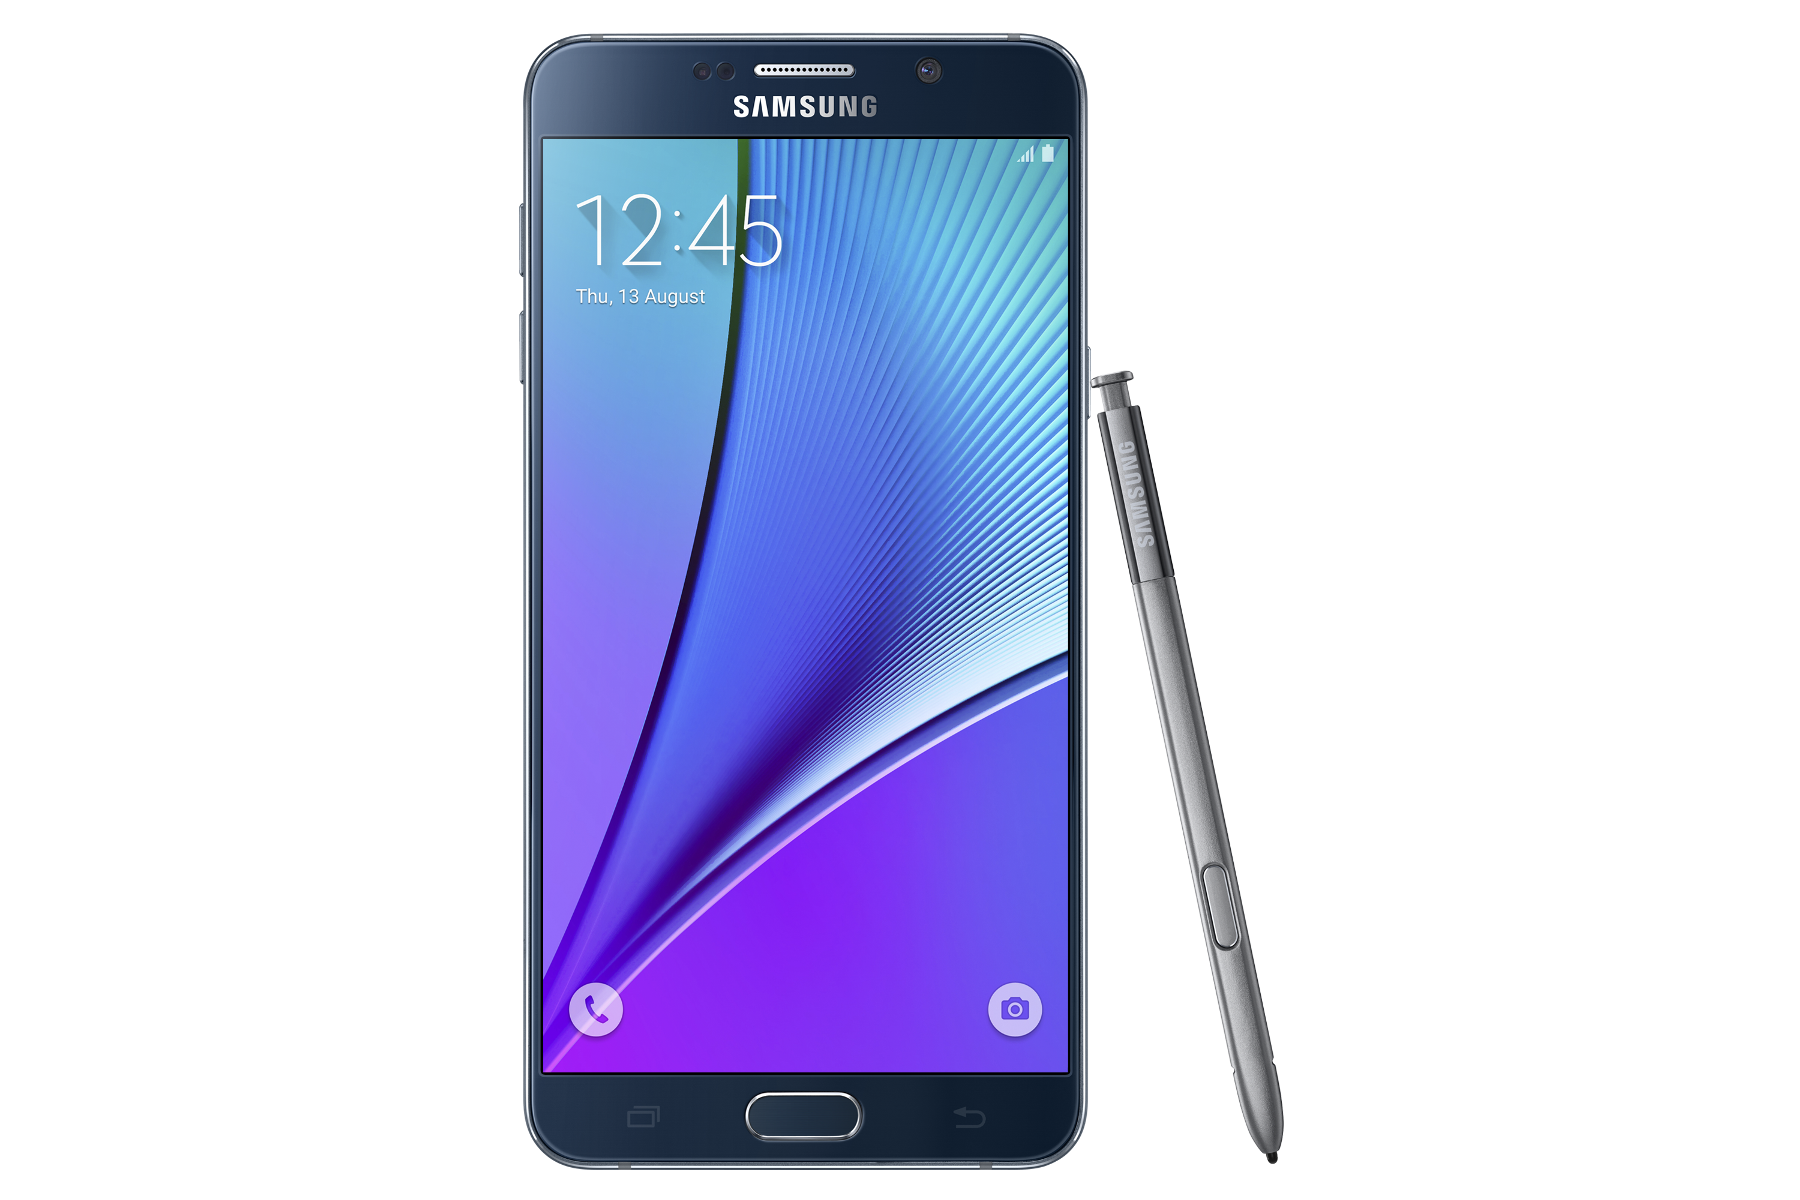 Galaxy Note5 Dual SIM Black front